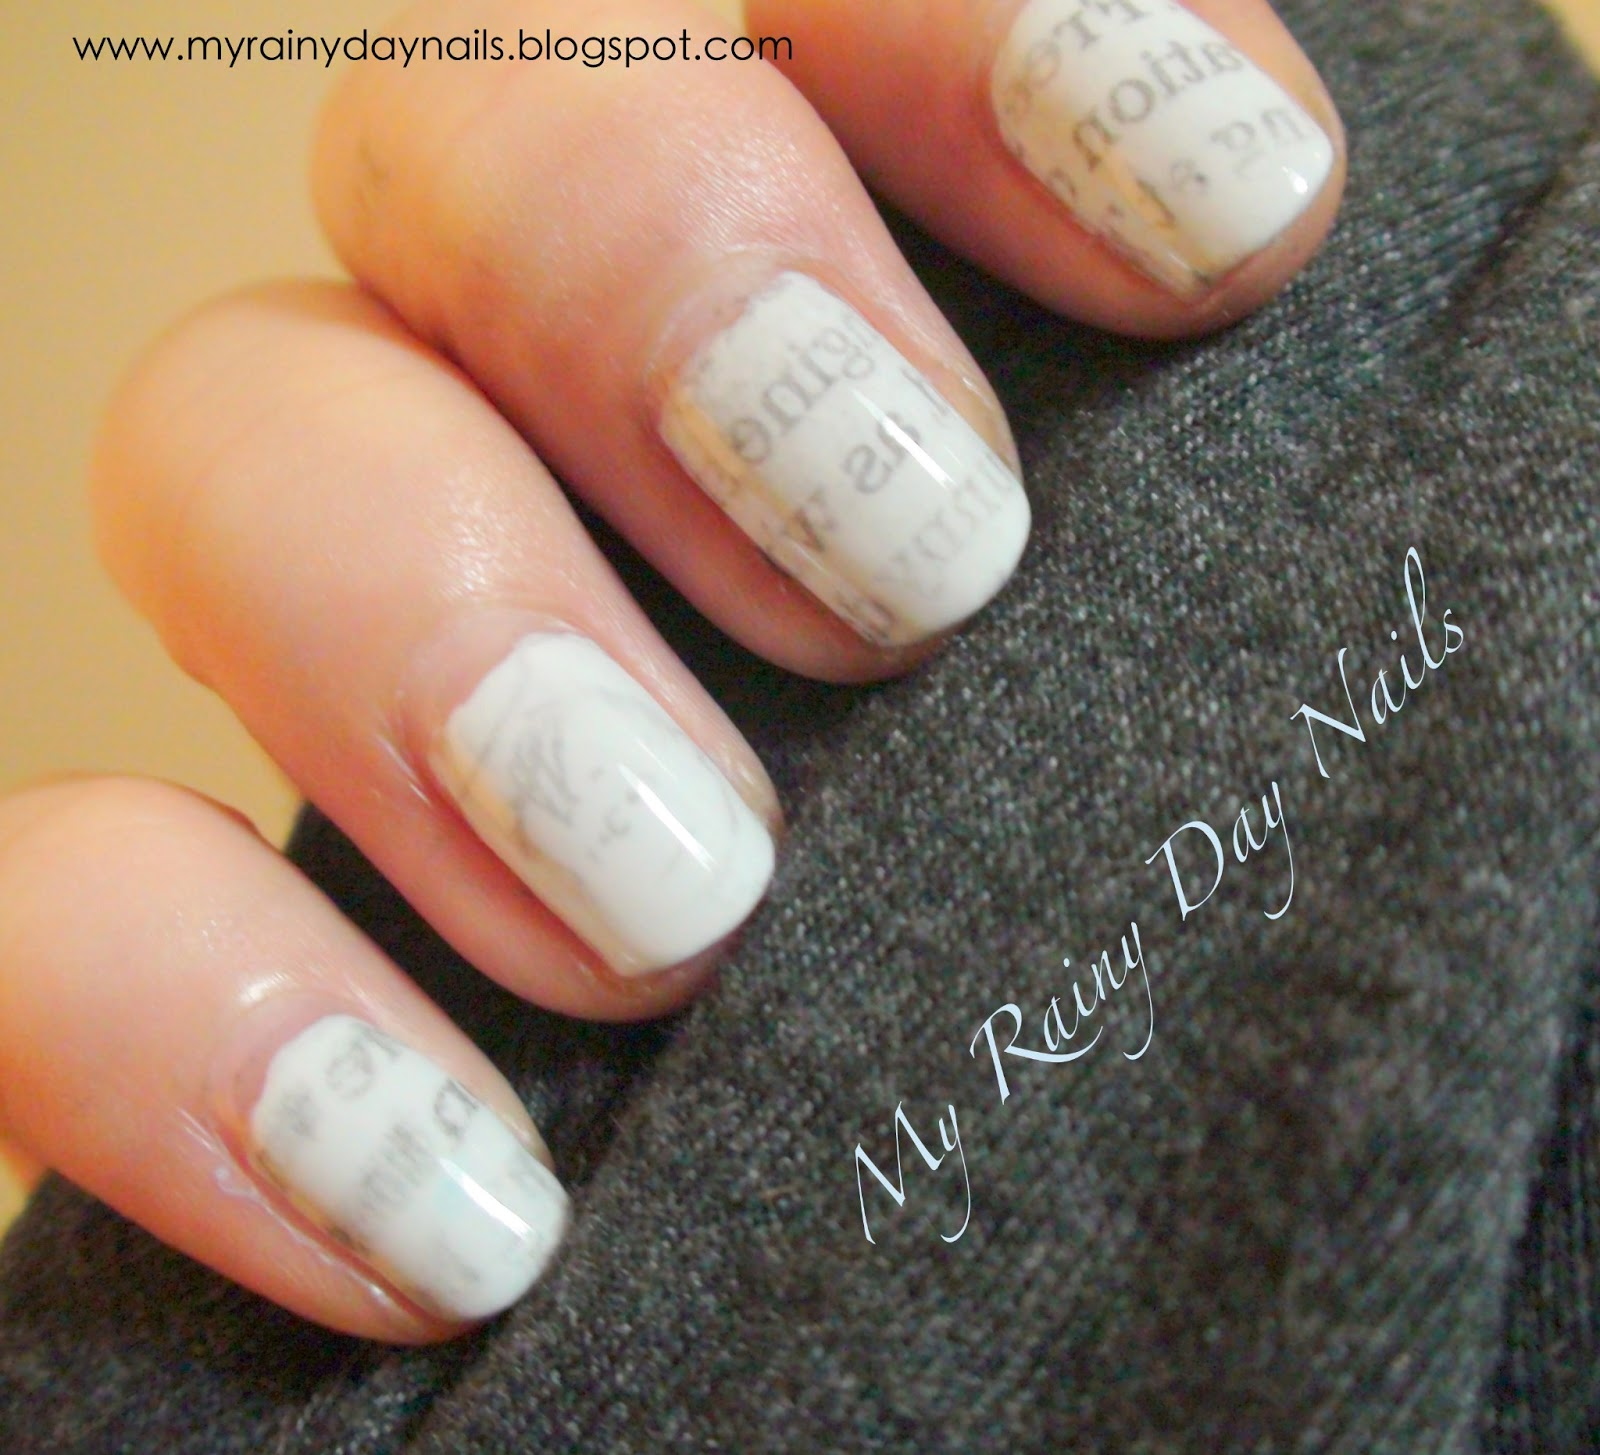 My Rainy Day Nails: Sunday Nail Art-Newspaper nails